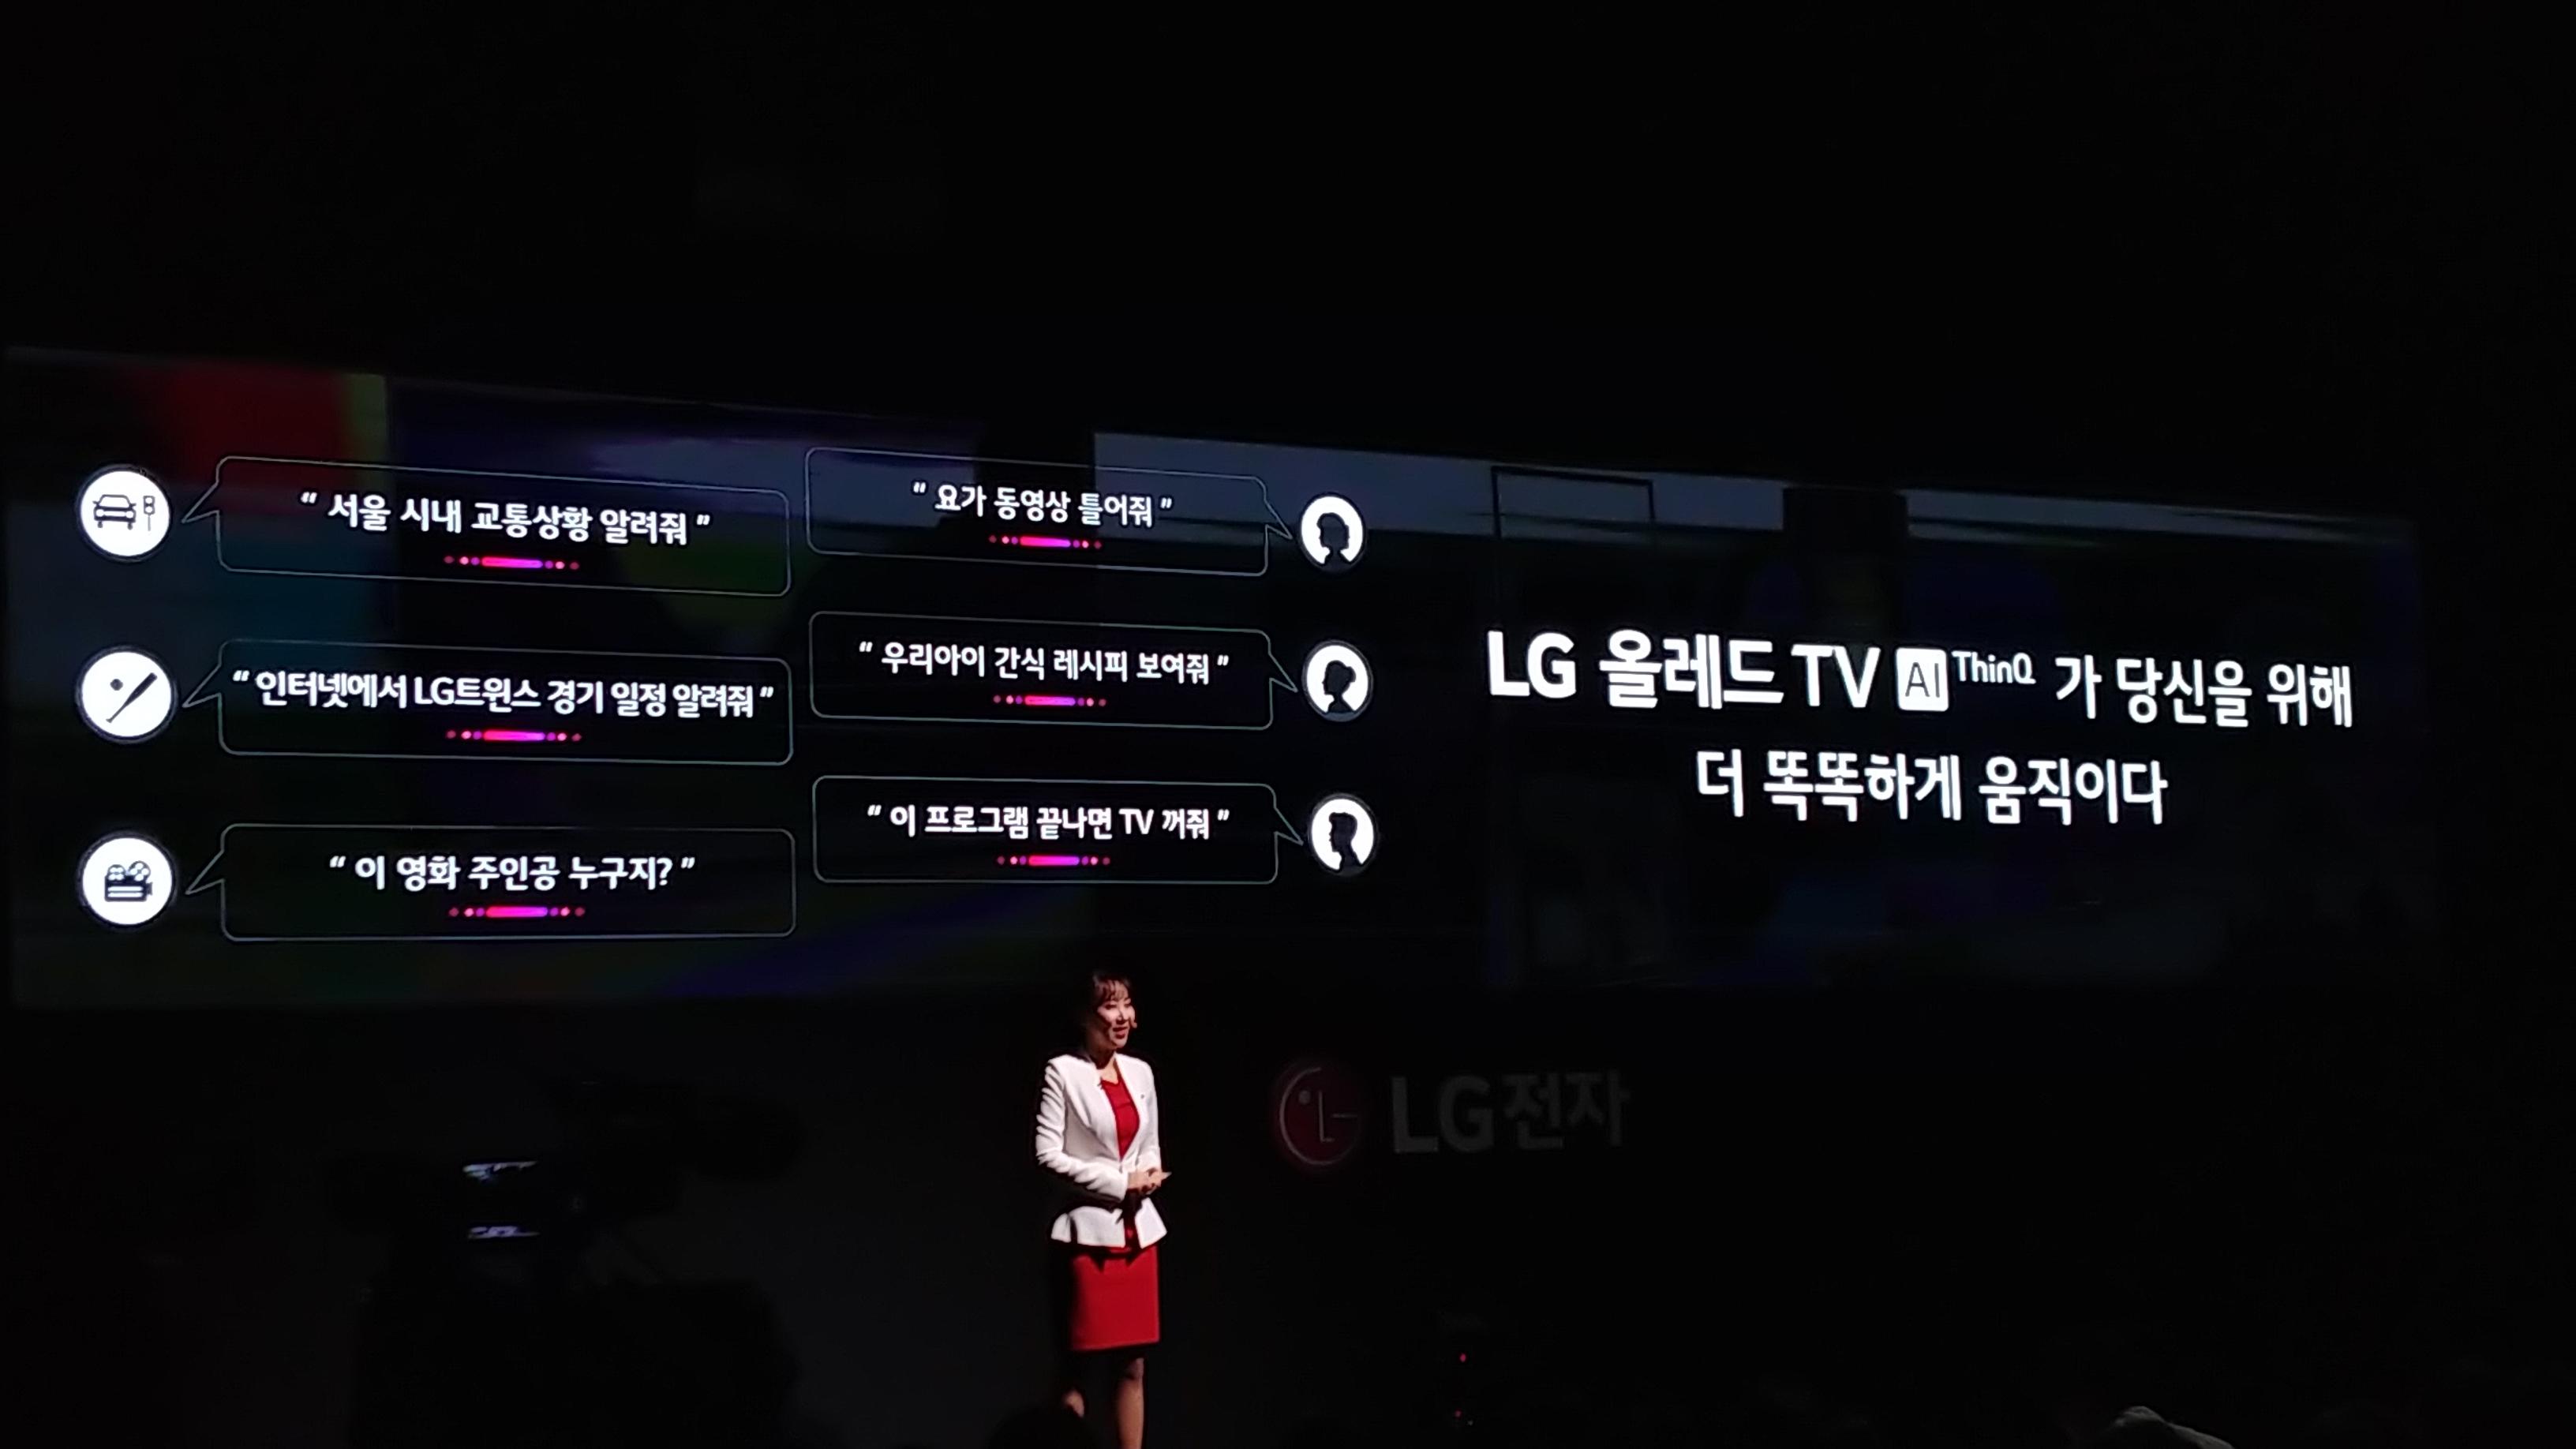 LG 올레드 TV AI 씽큐가 당신을 위해 더 똑똑하게 움직이다.